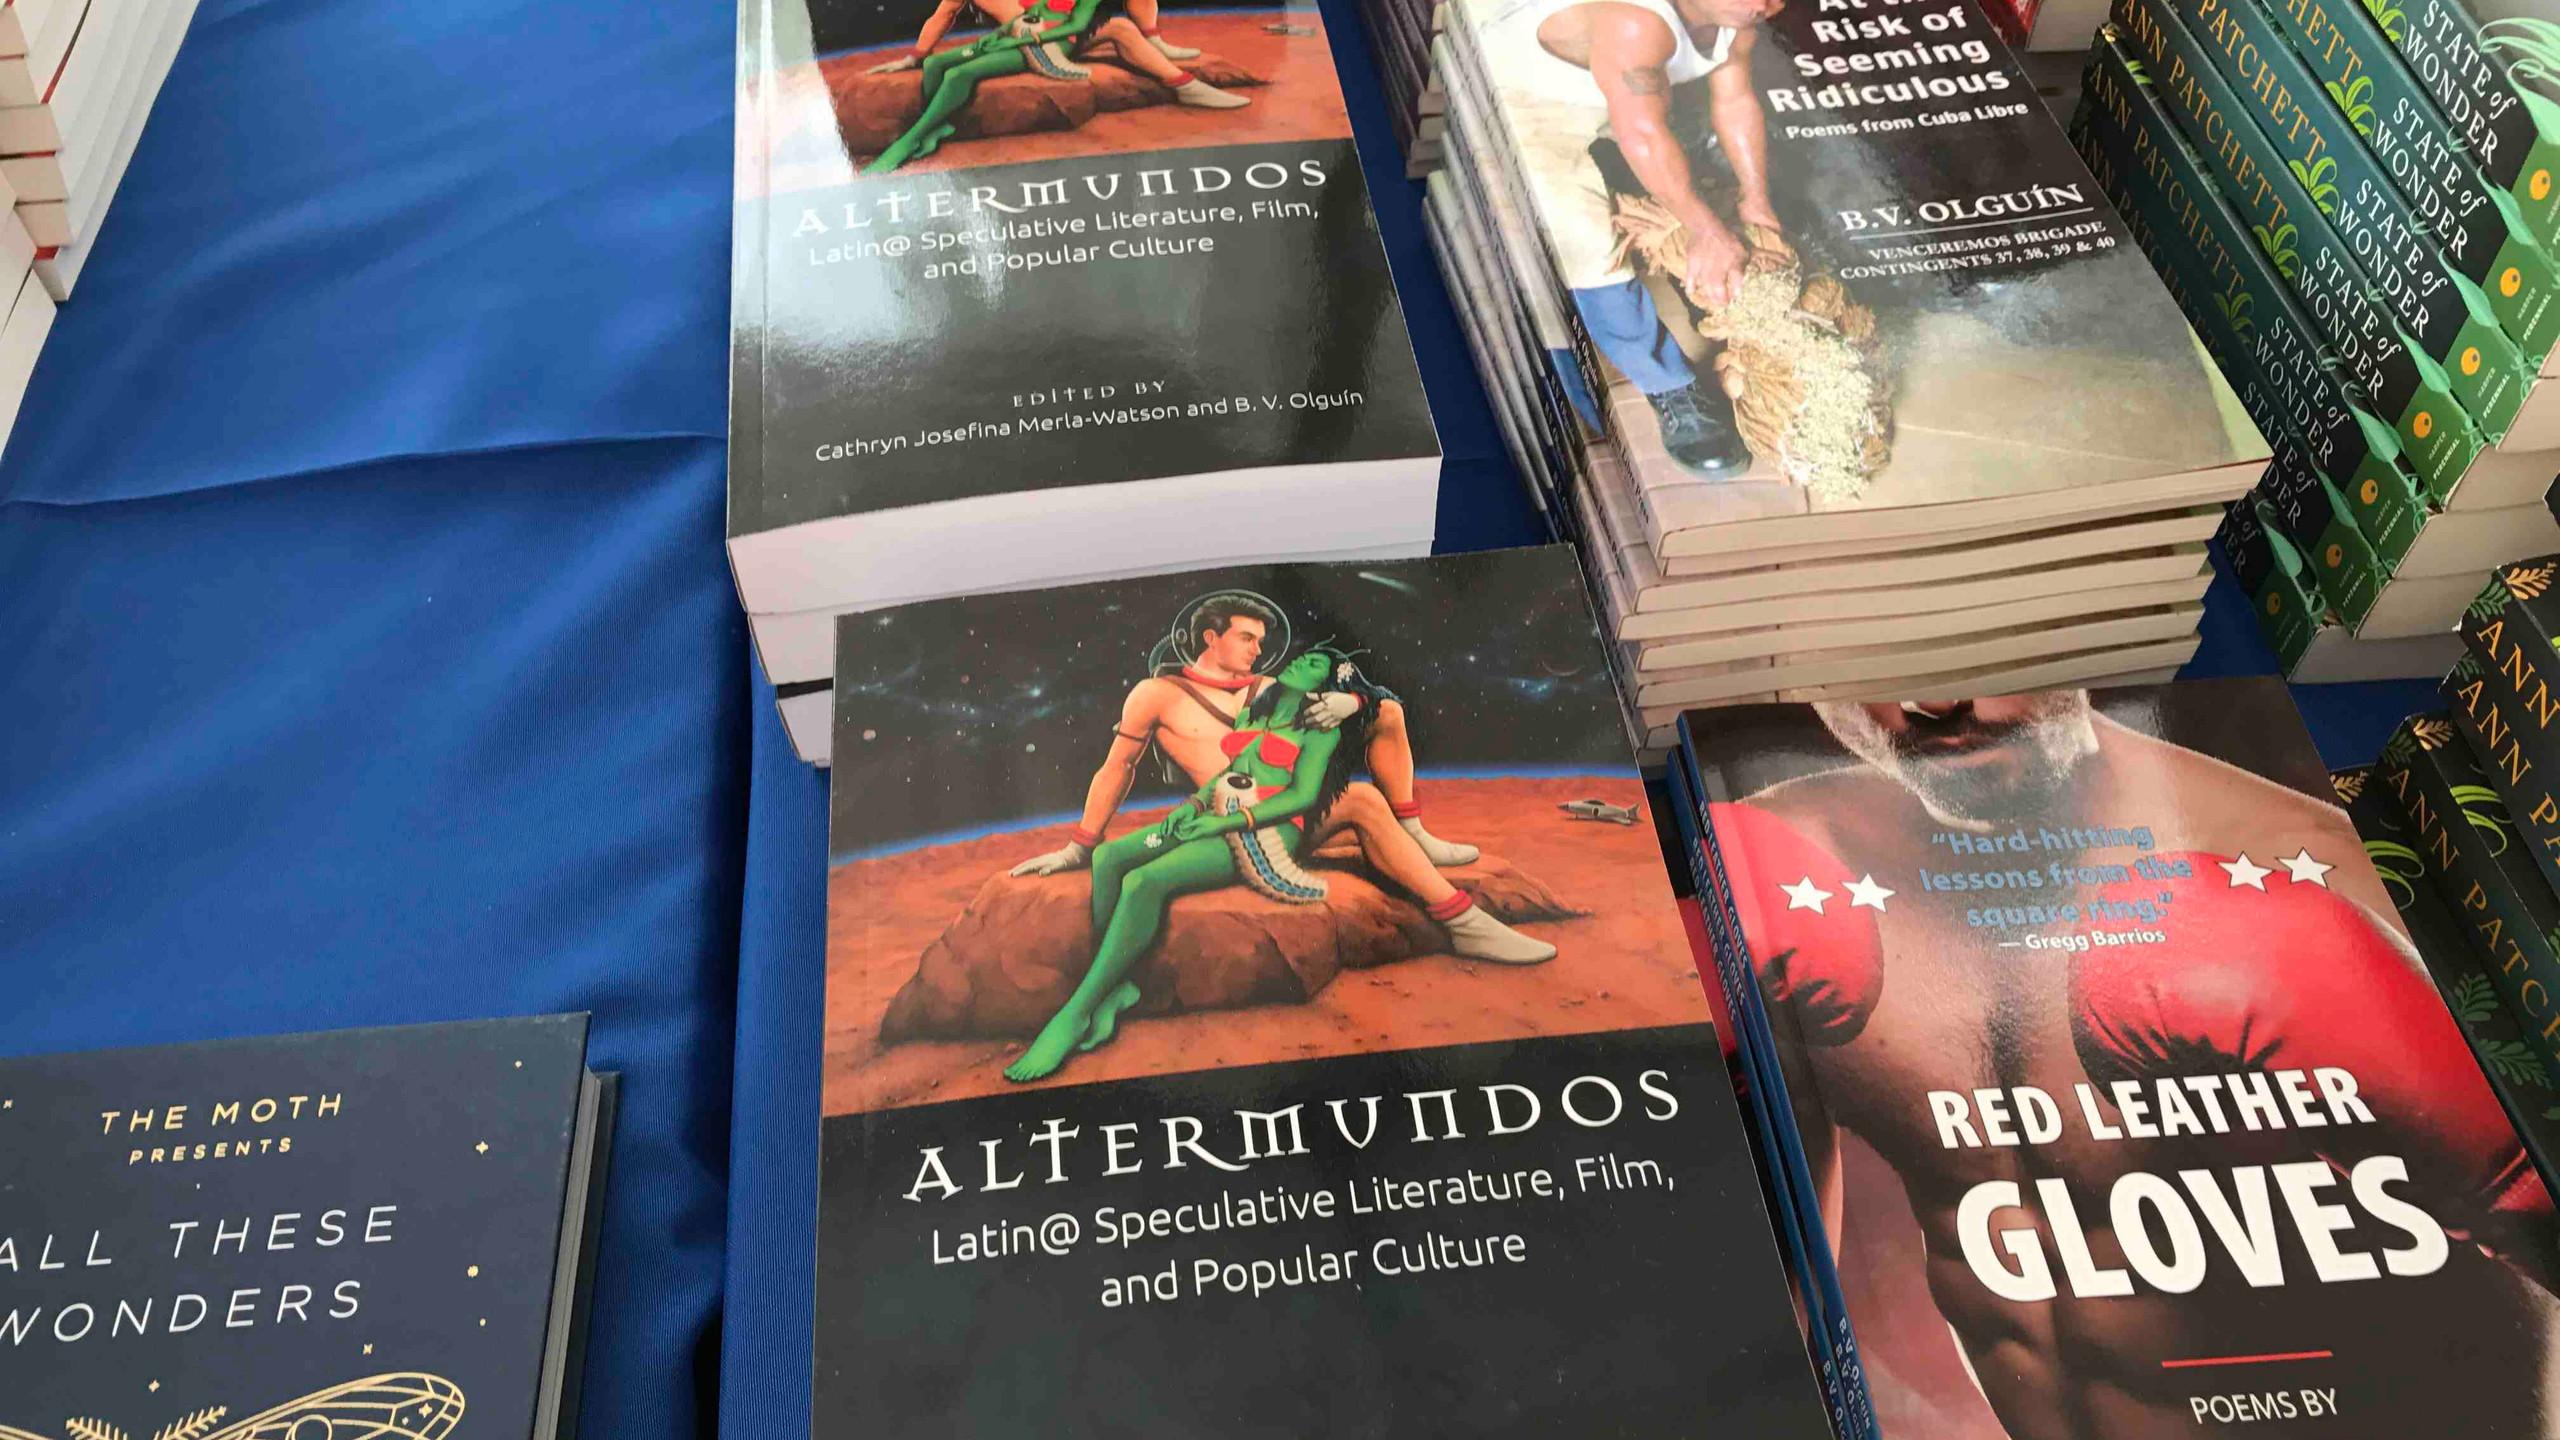 Altermundos the book on sale